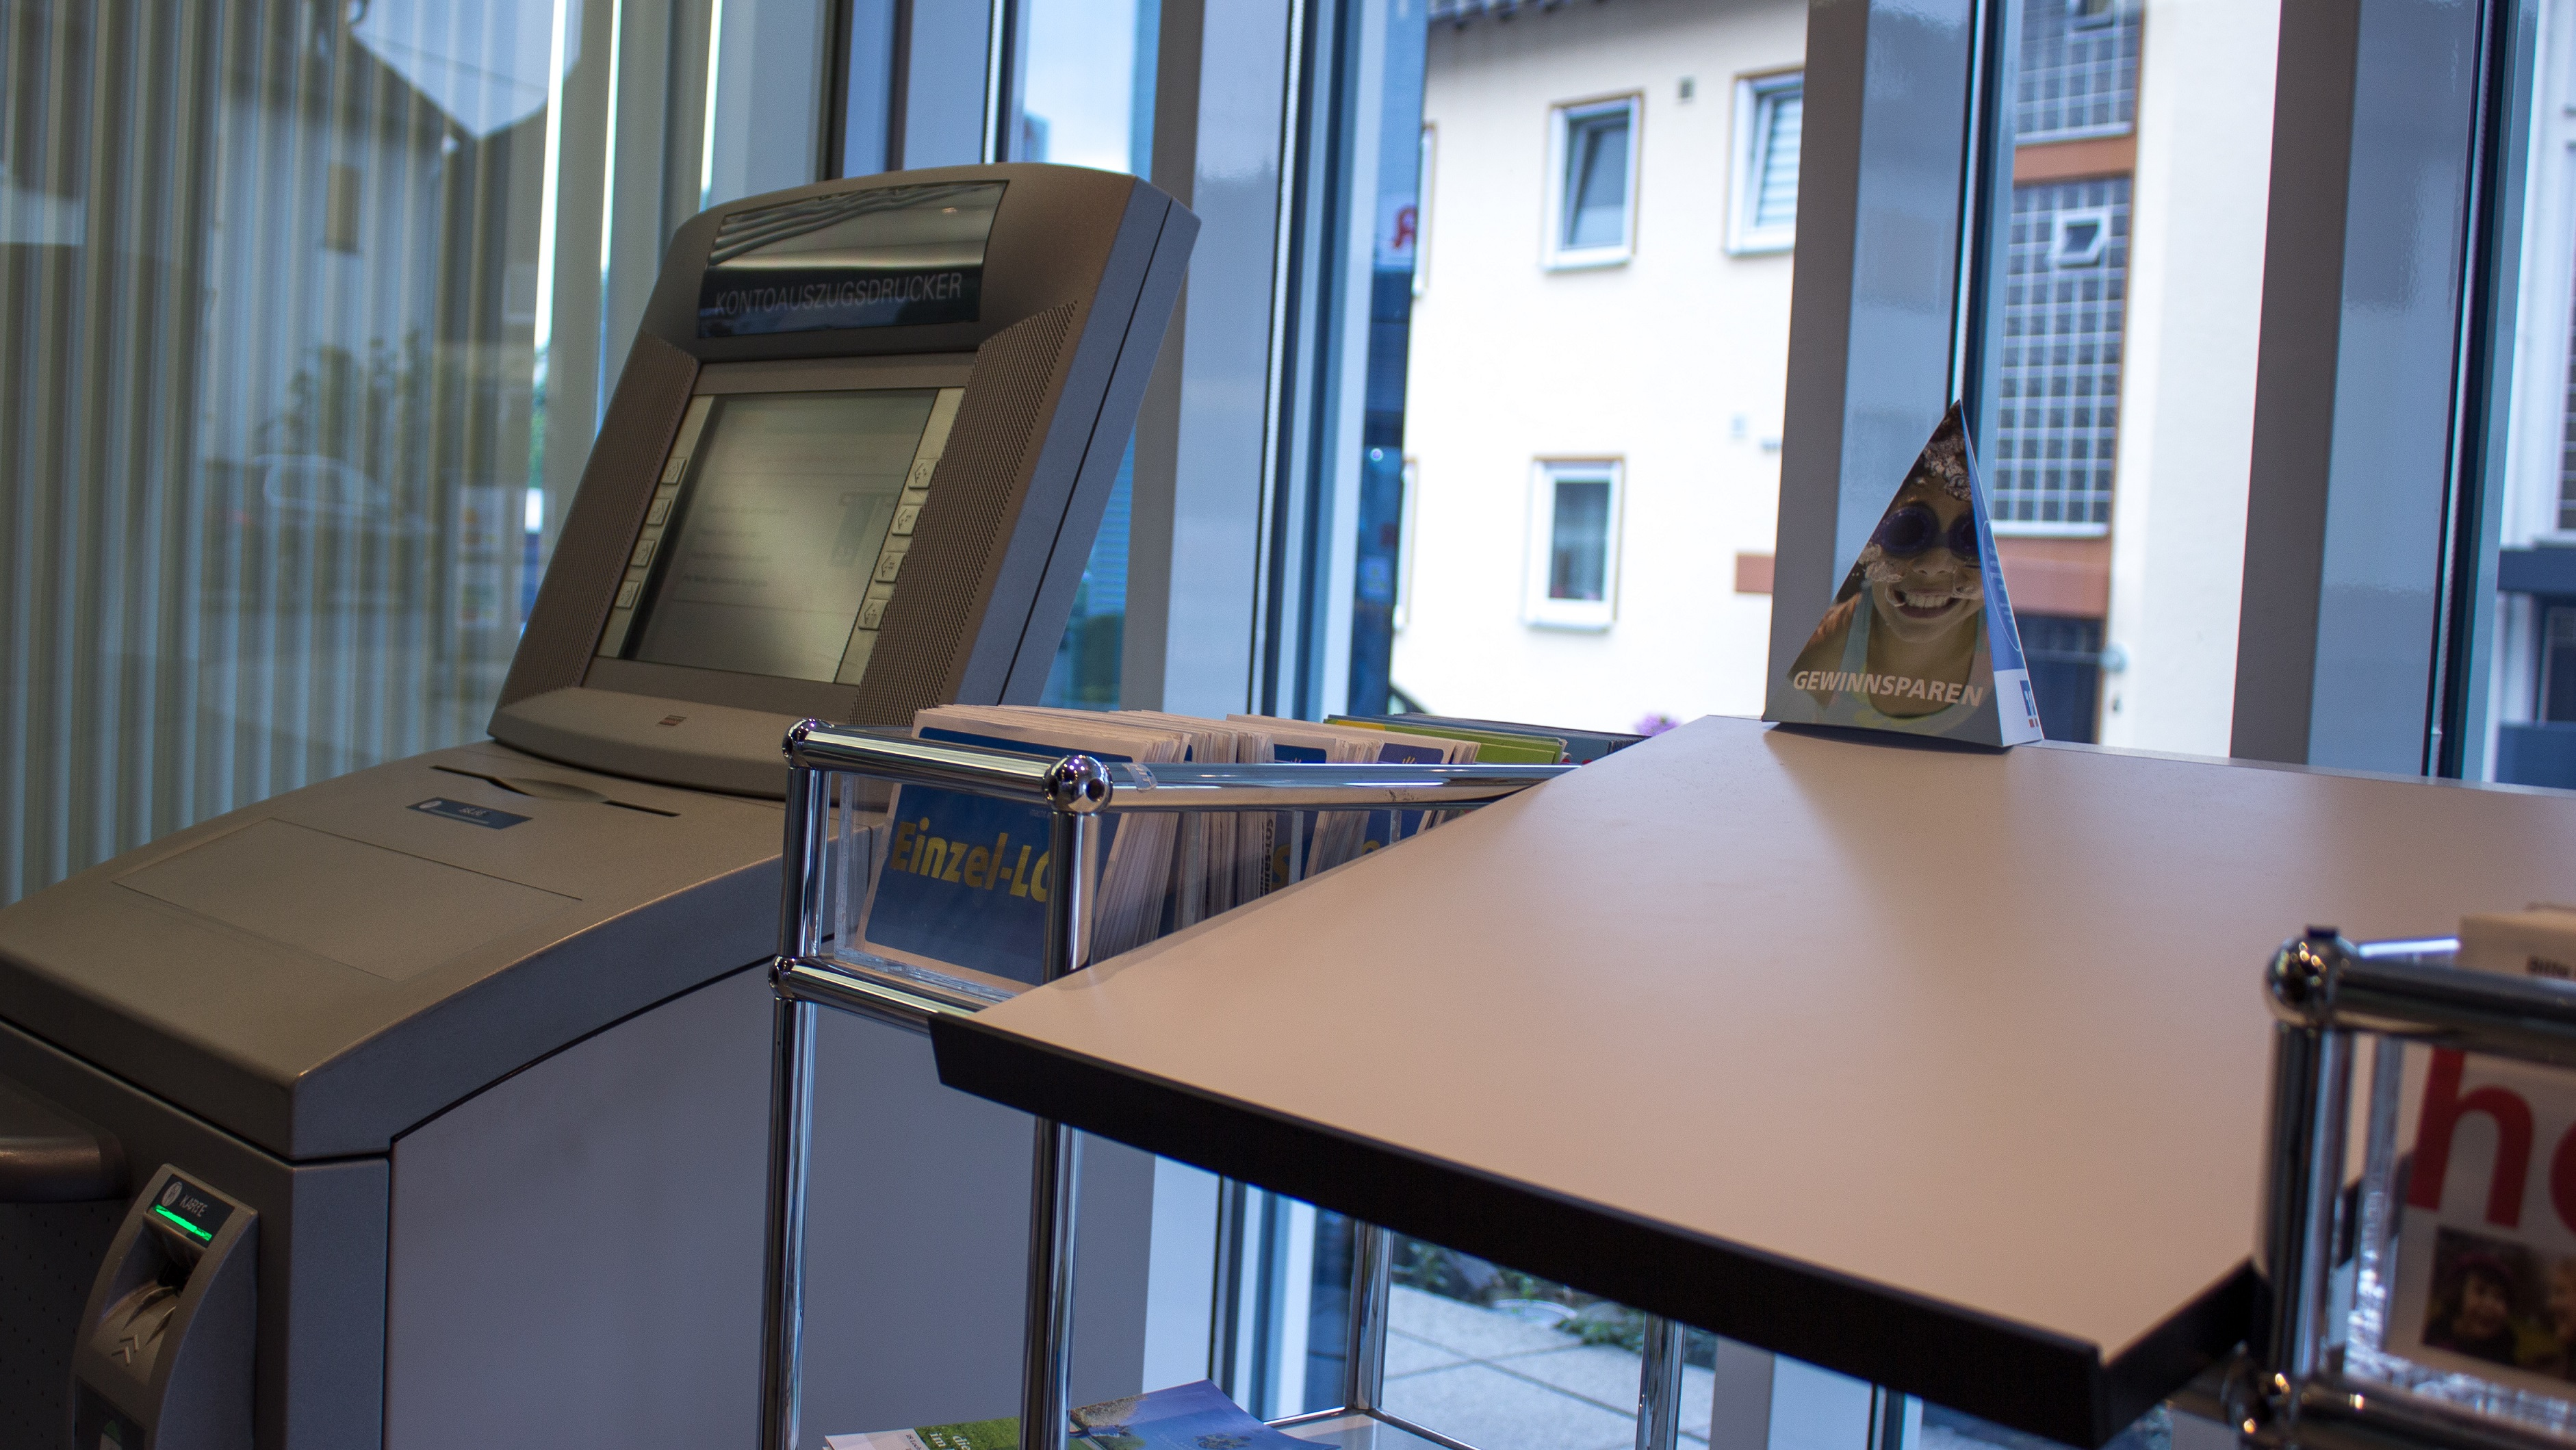 Foto de vr bank Untertaunus eG, Filiale Wörsdorf Idstein